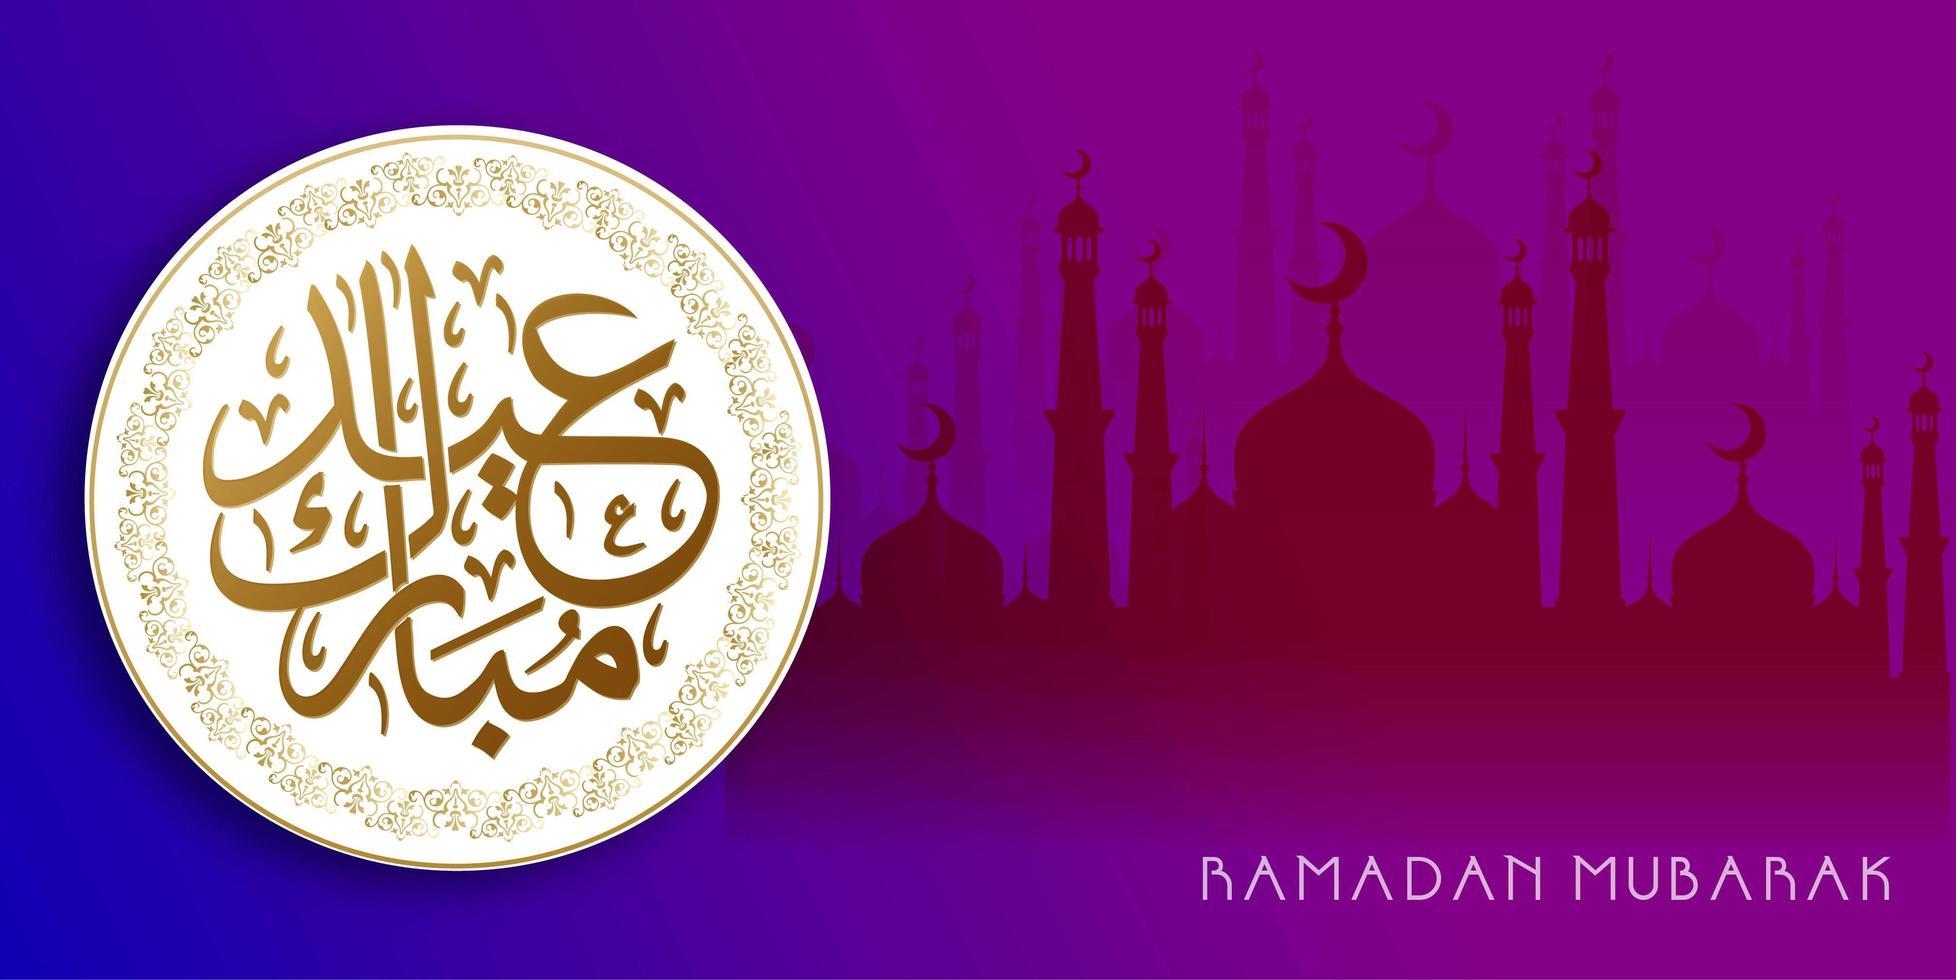 sfondo sfumato rosa blu ramadan kareem vettore